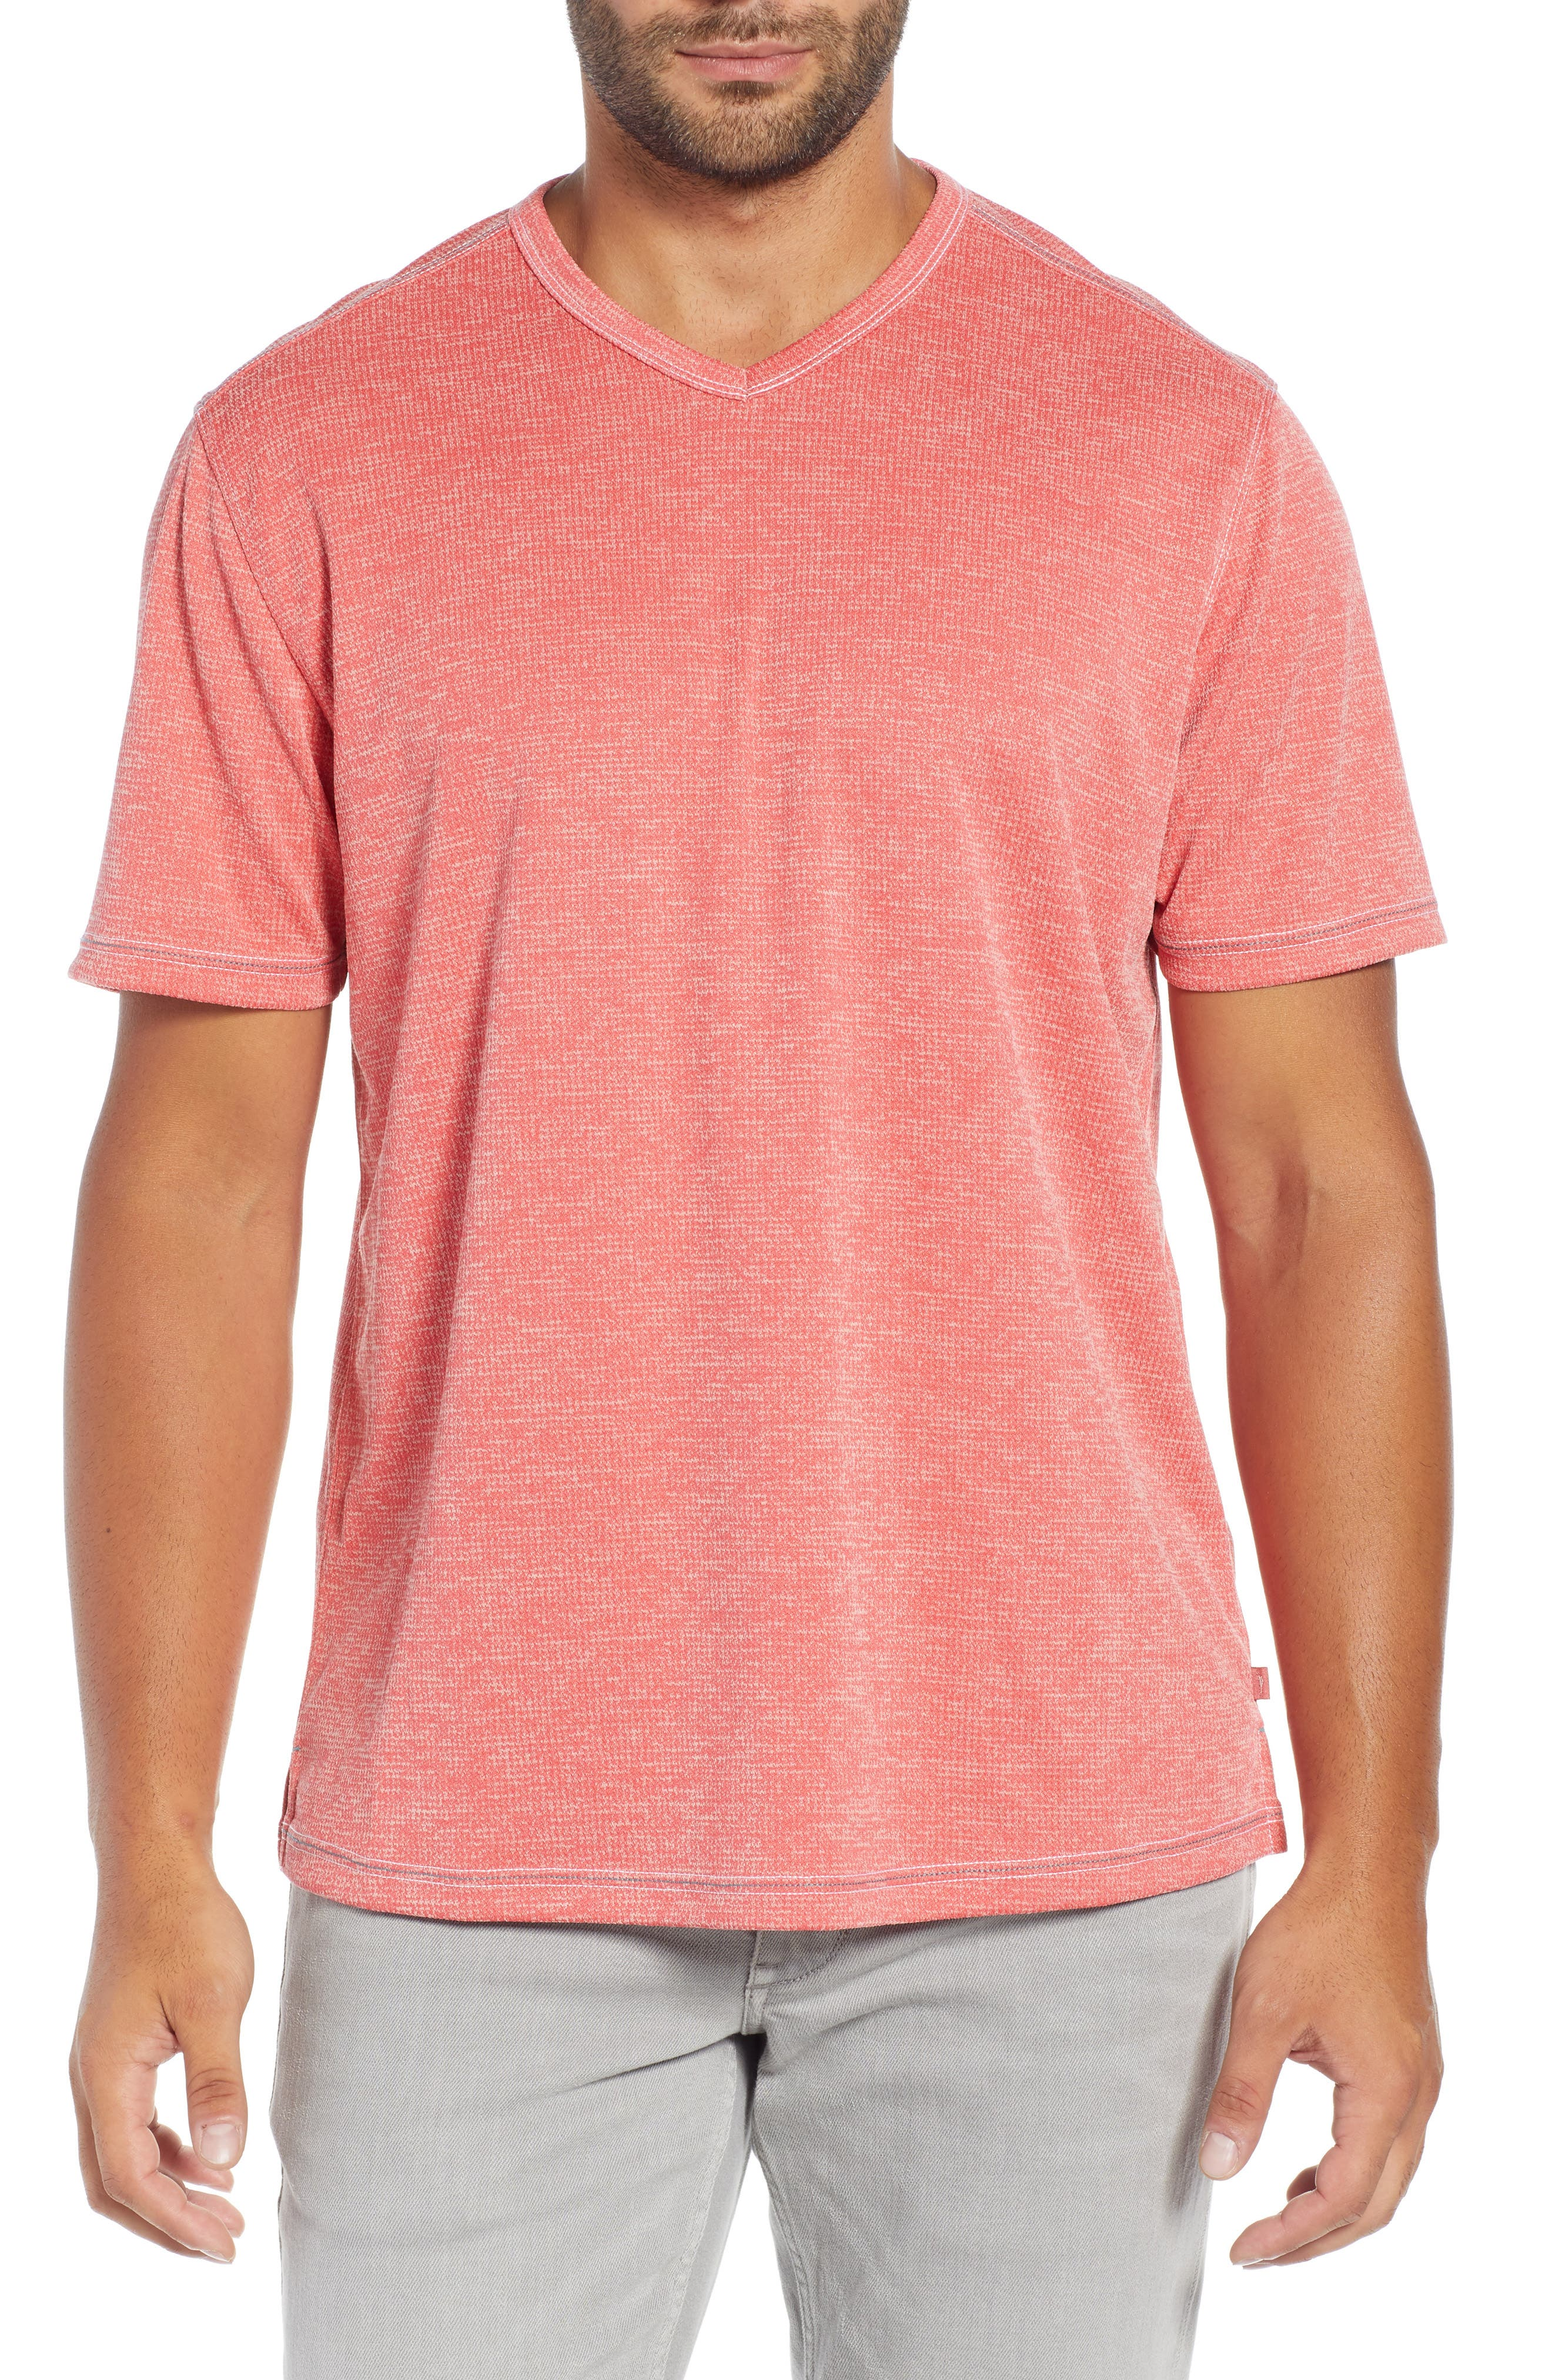 Sand Key V-Neck T-Shirt, Main, color, CORAL HAZE